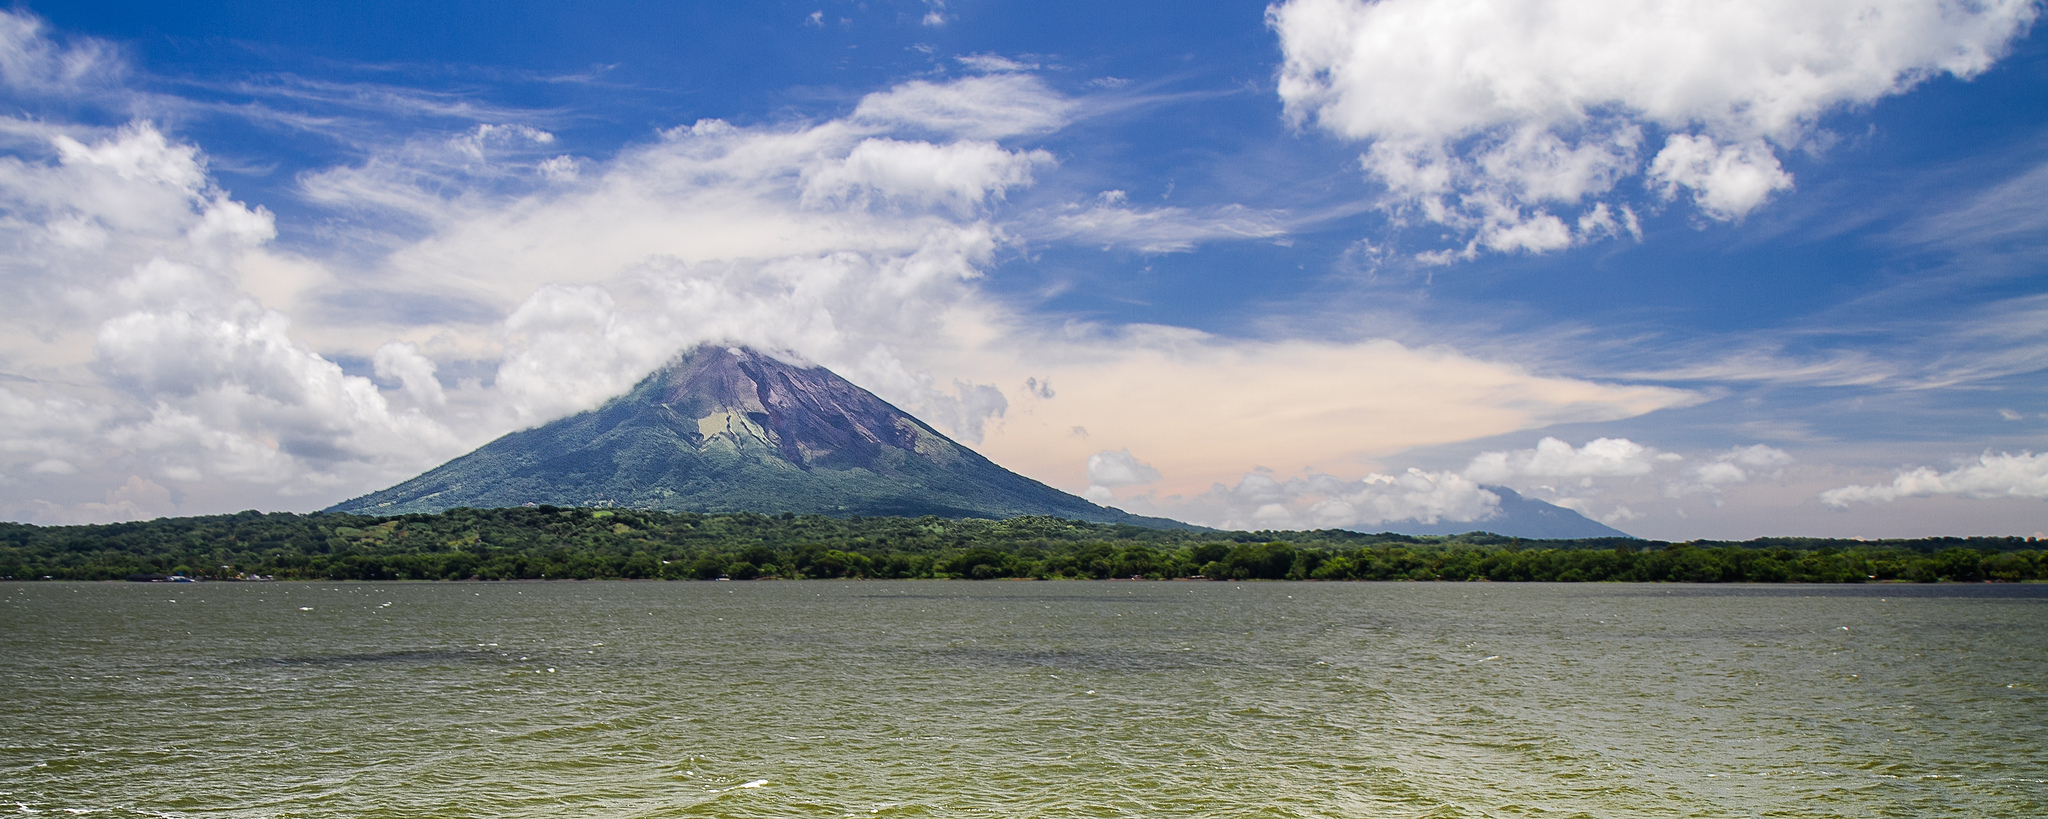 The proposedcanal would cut through Lake Nicaragua. Photo: David Armstrong.